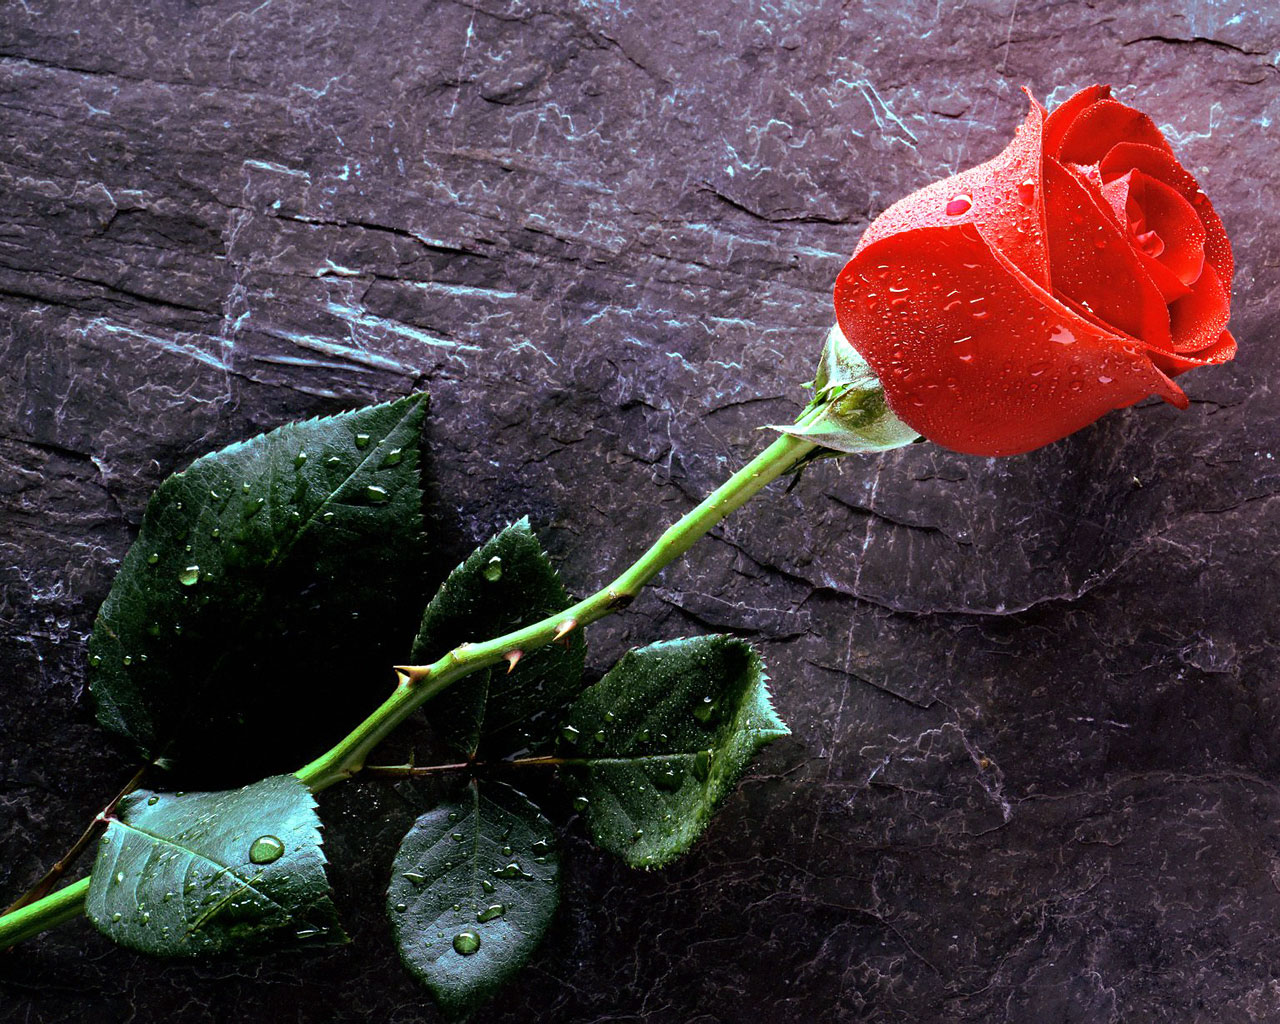 http://2.bp.blogspot.com/-s_G9V1CHb5I/TvhfN4wWMVI/AAAAAAAAA34/n8xgs3vjahI/s1600/red_rose.jpg